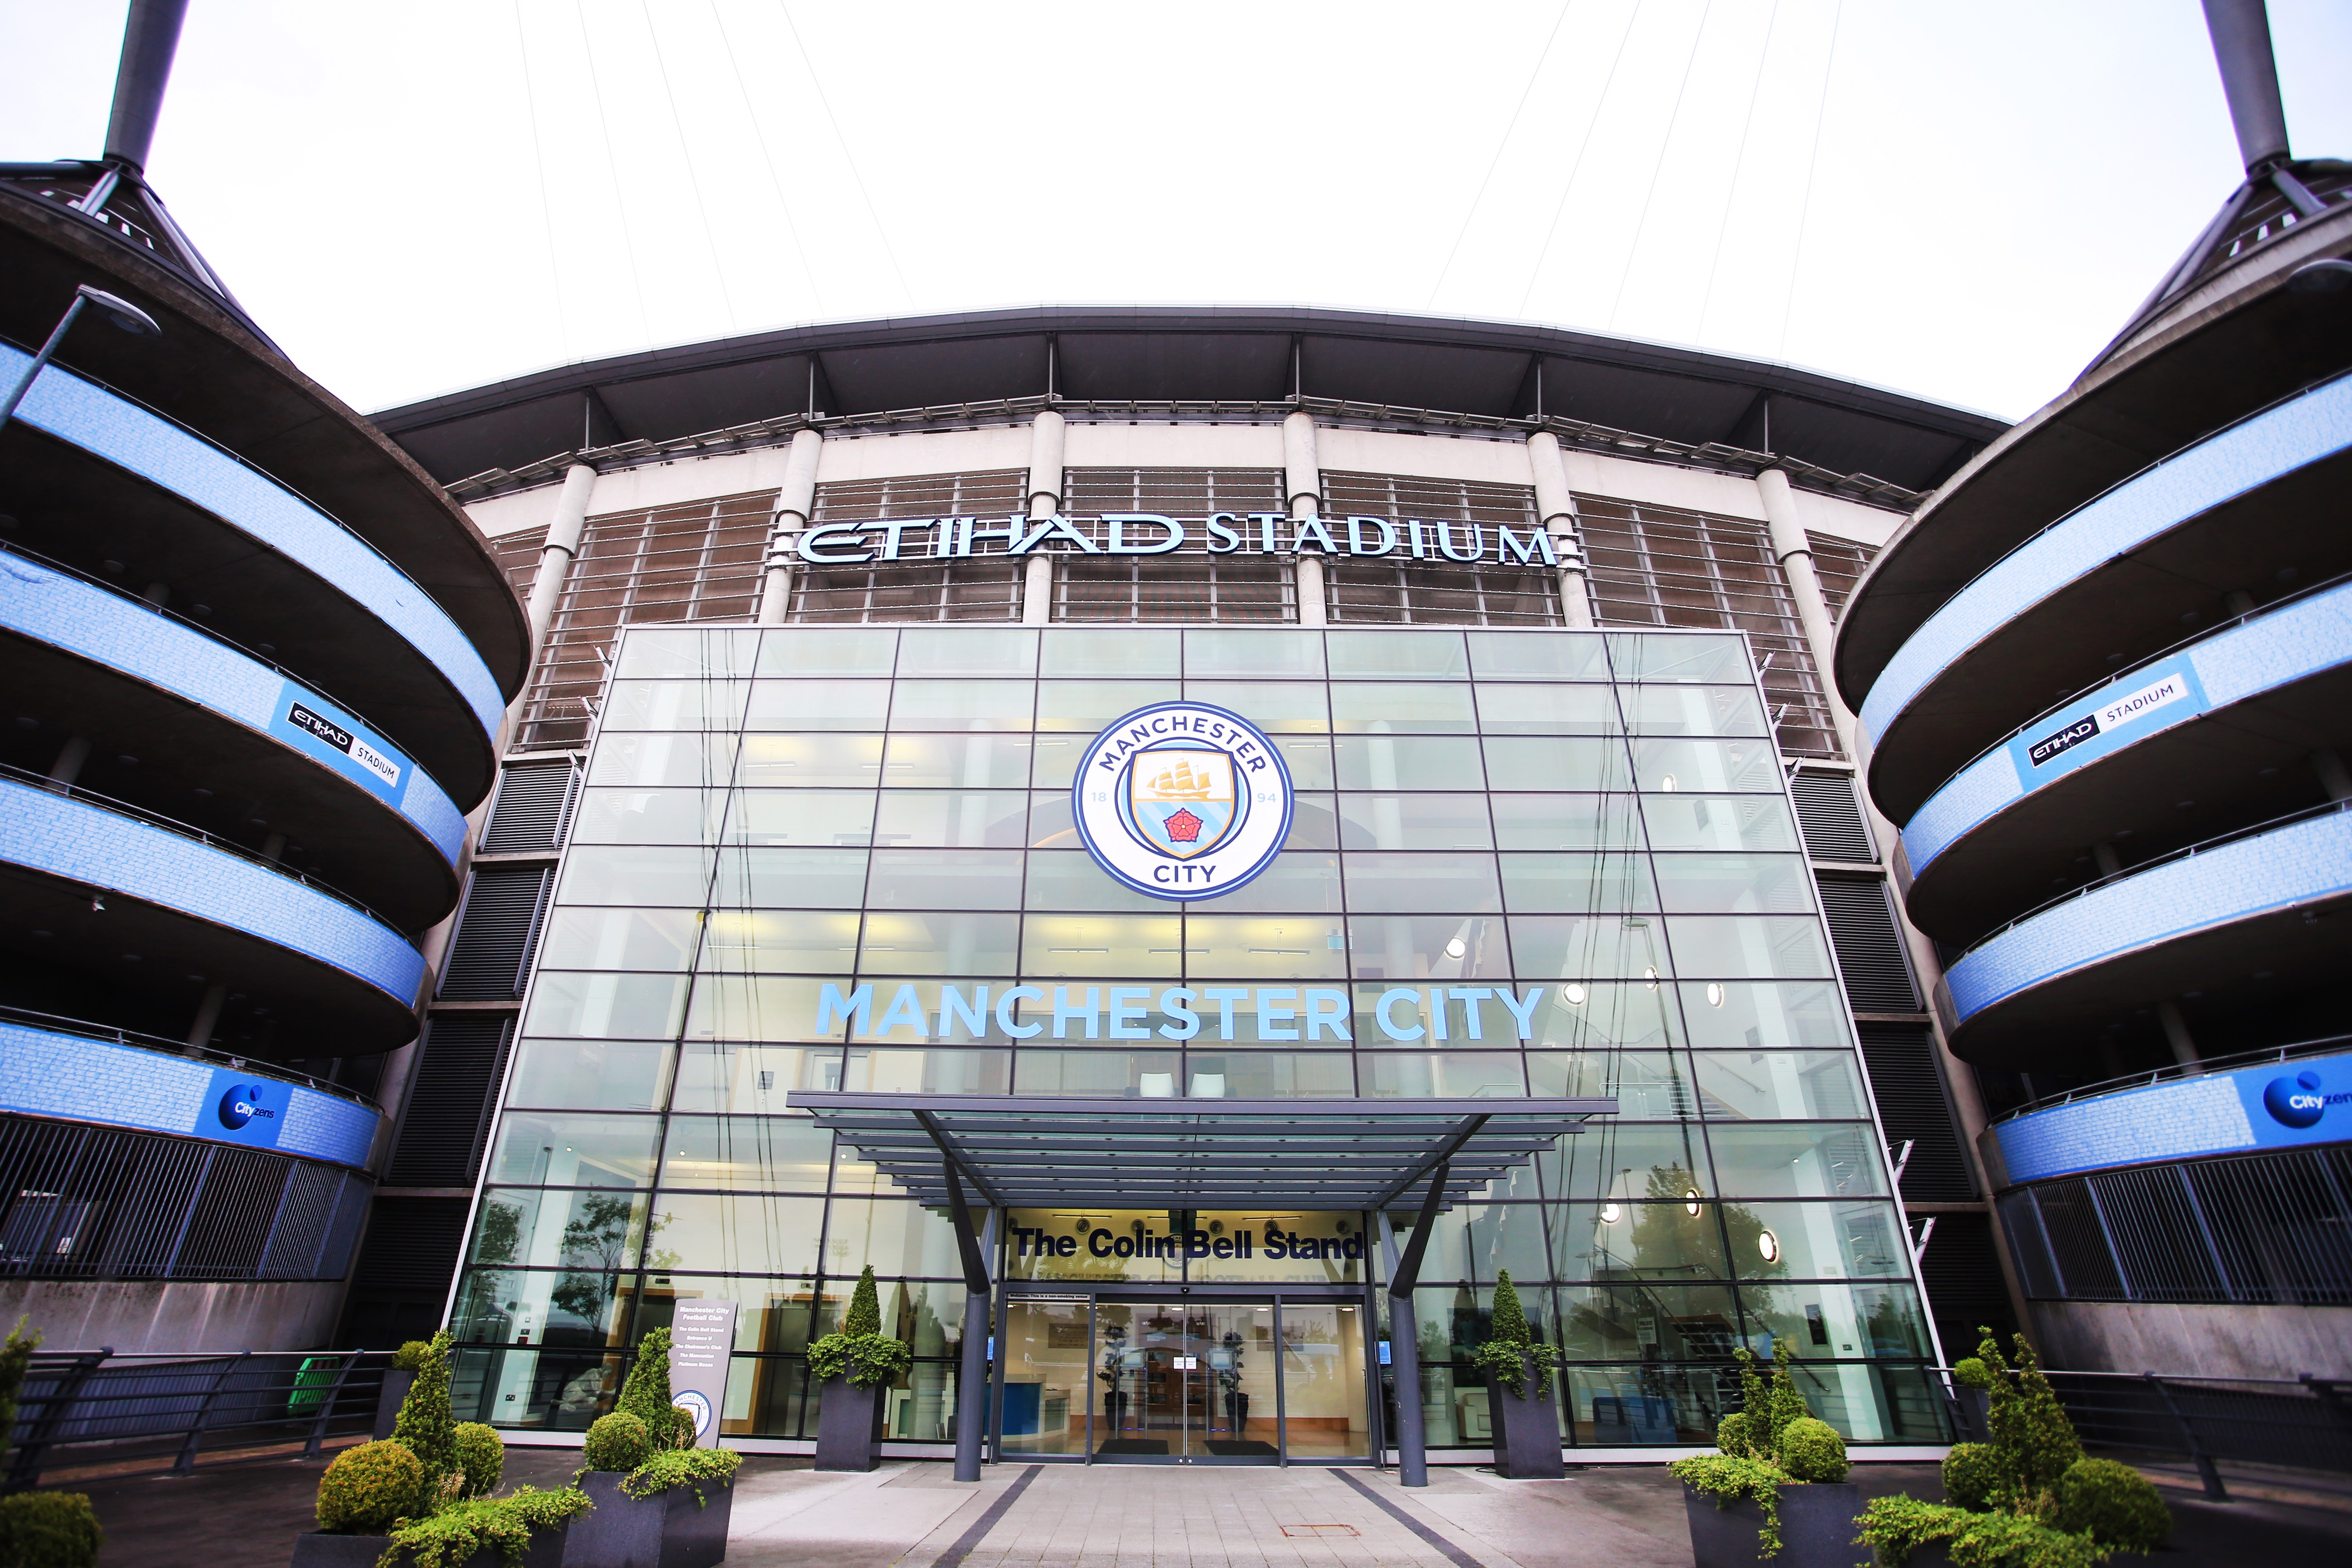 Chelsea stadium tour opening times